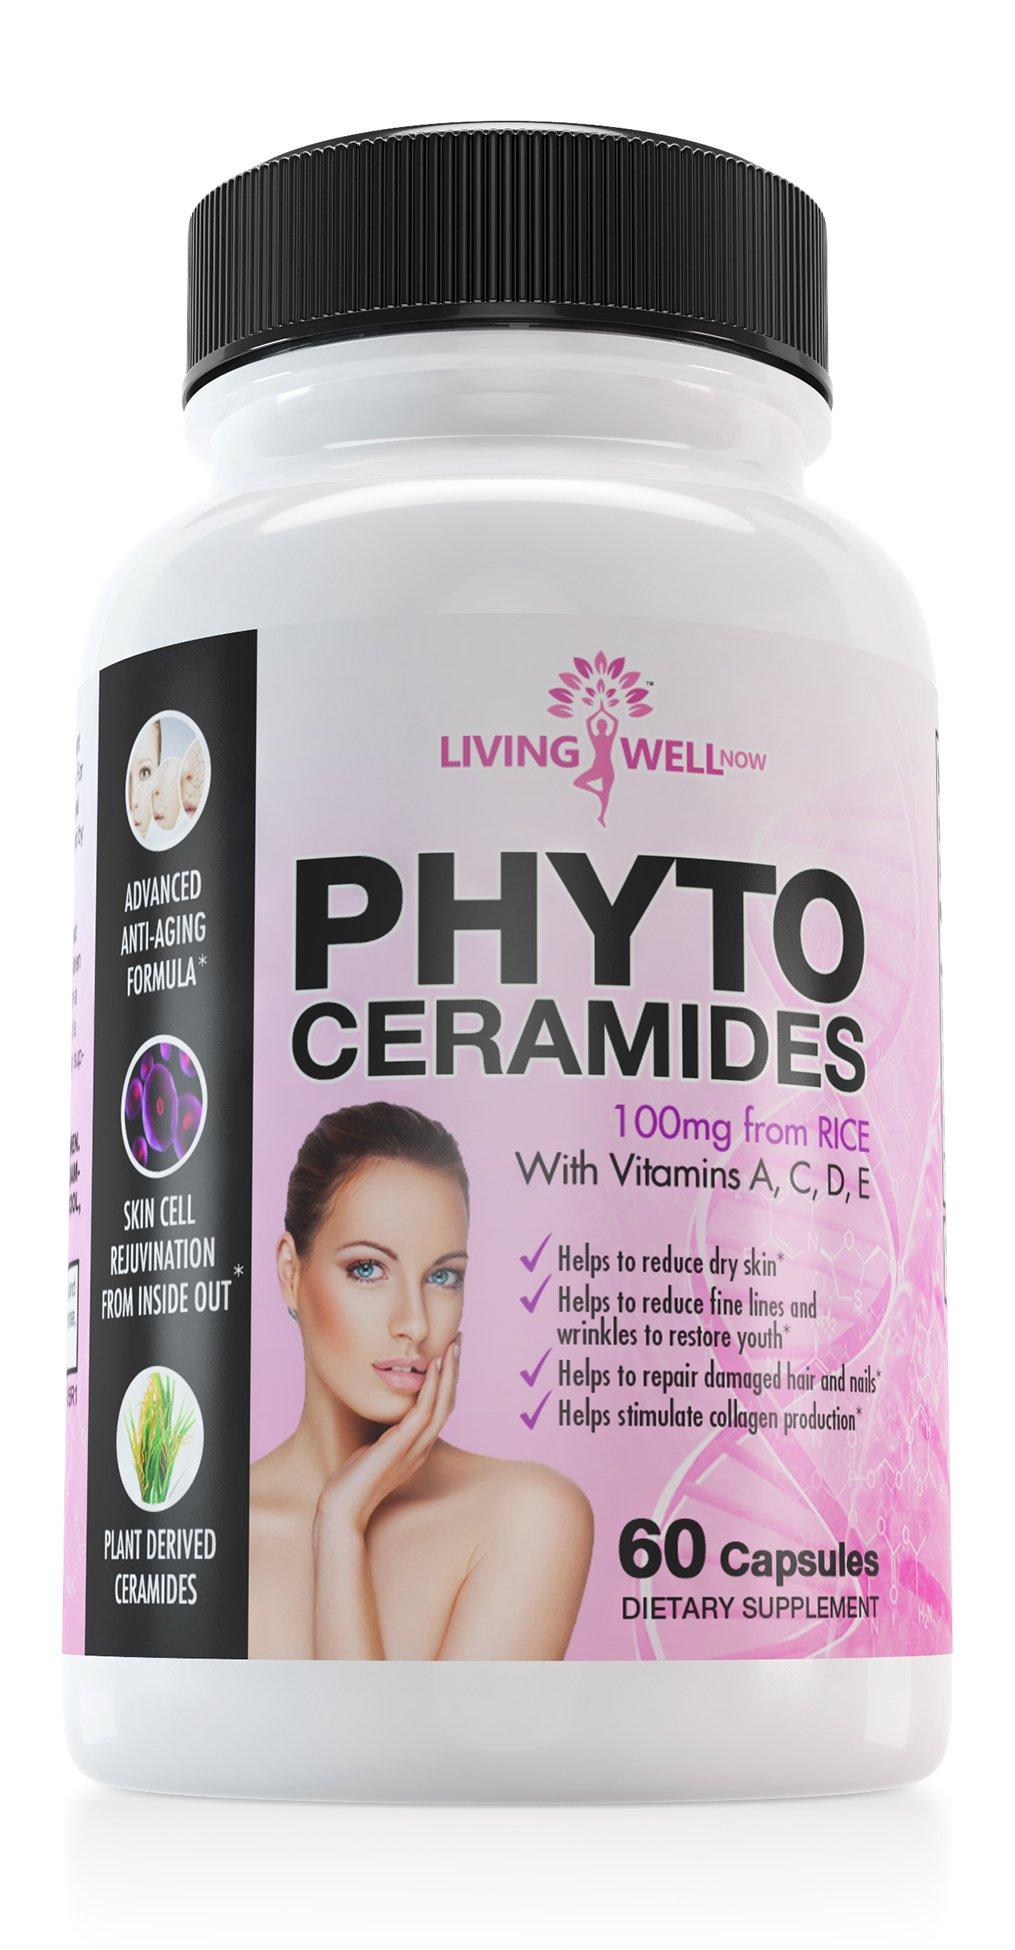 Phytoceramides Natural Rice Based Multi Vitamin Skin Care Supplement for Women and Men. Advanced Dermal Renewal Ceramide Capsules For Dry and Aging Skin.